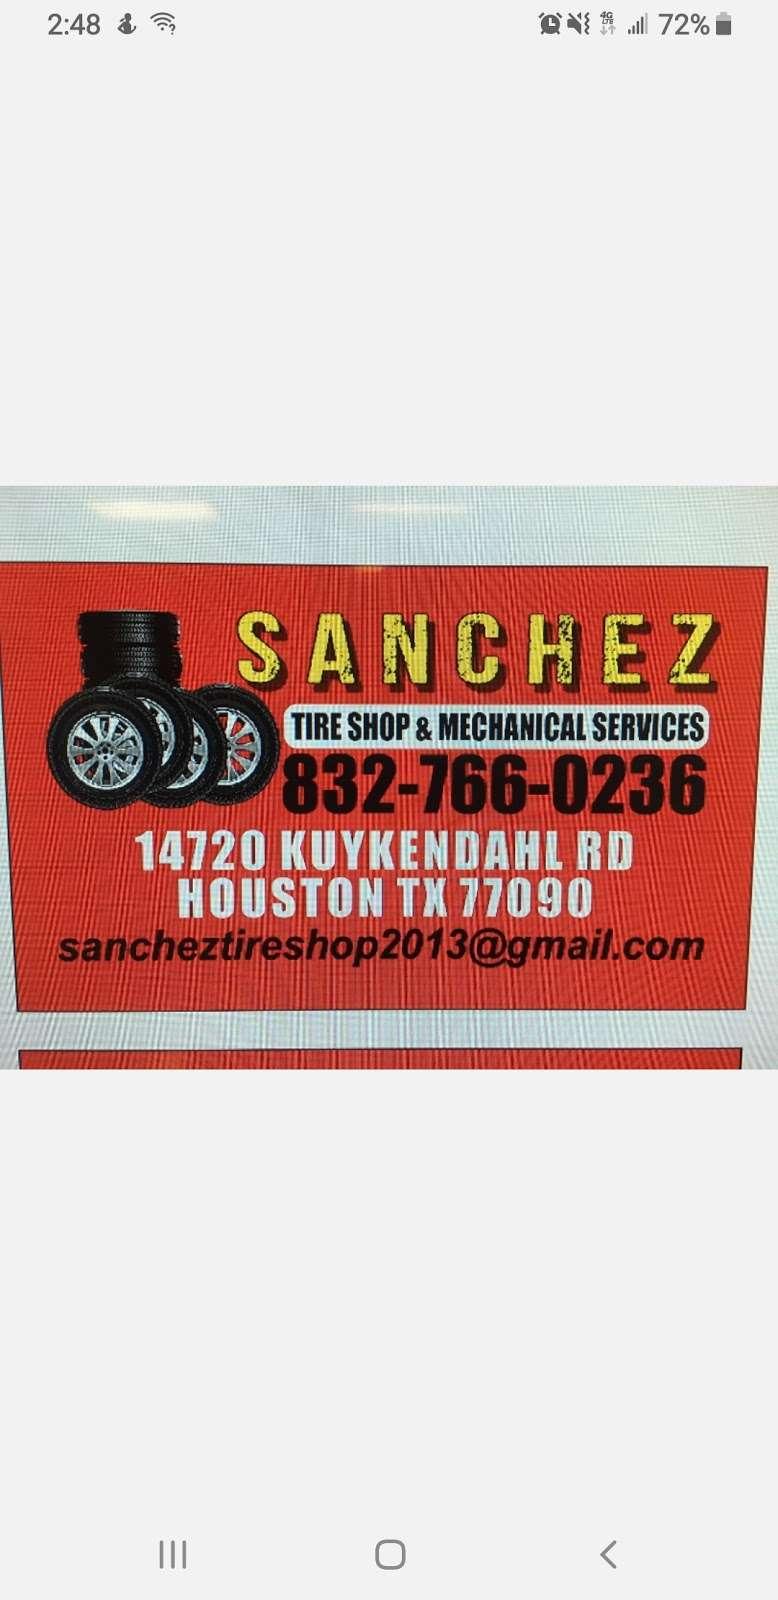 Sanchez Tire Shop - car repair  | Photo 7 of 8 | Address: 14720 Kuykendahl Rd, Houston, TX 77090, USA | Phone: (832) 766-0236